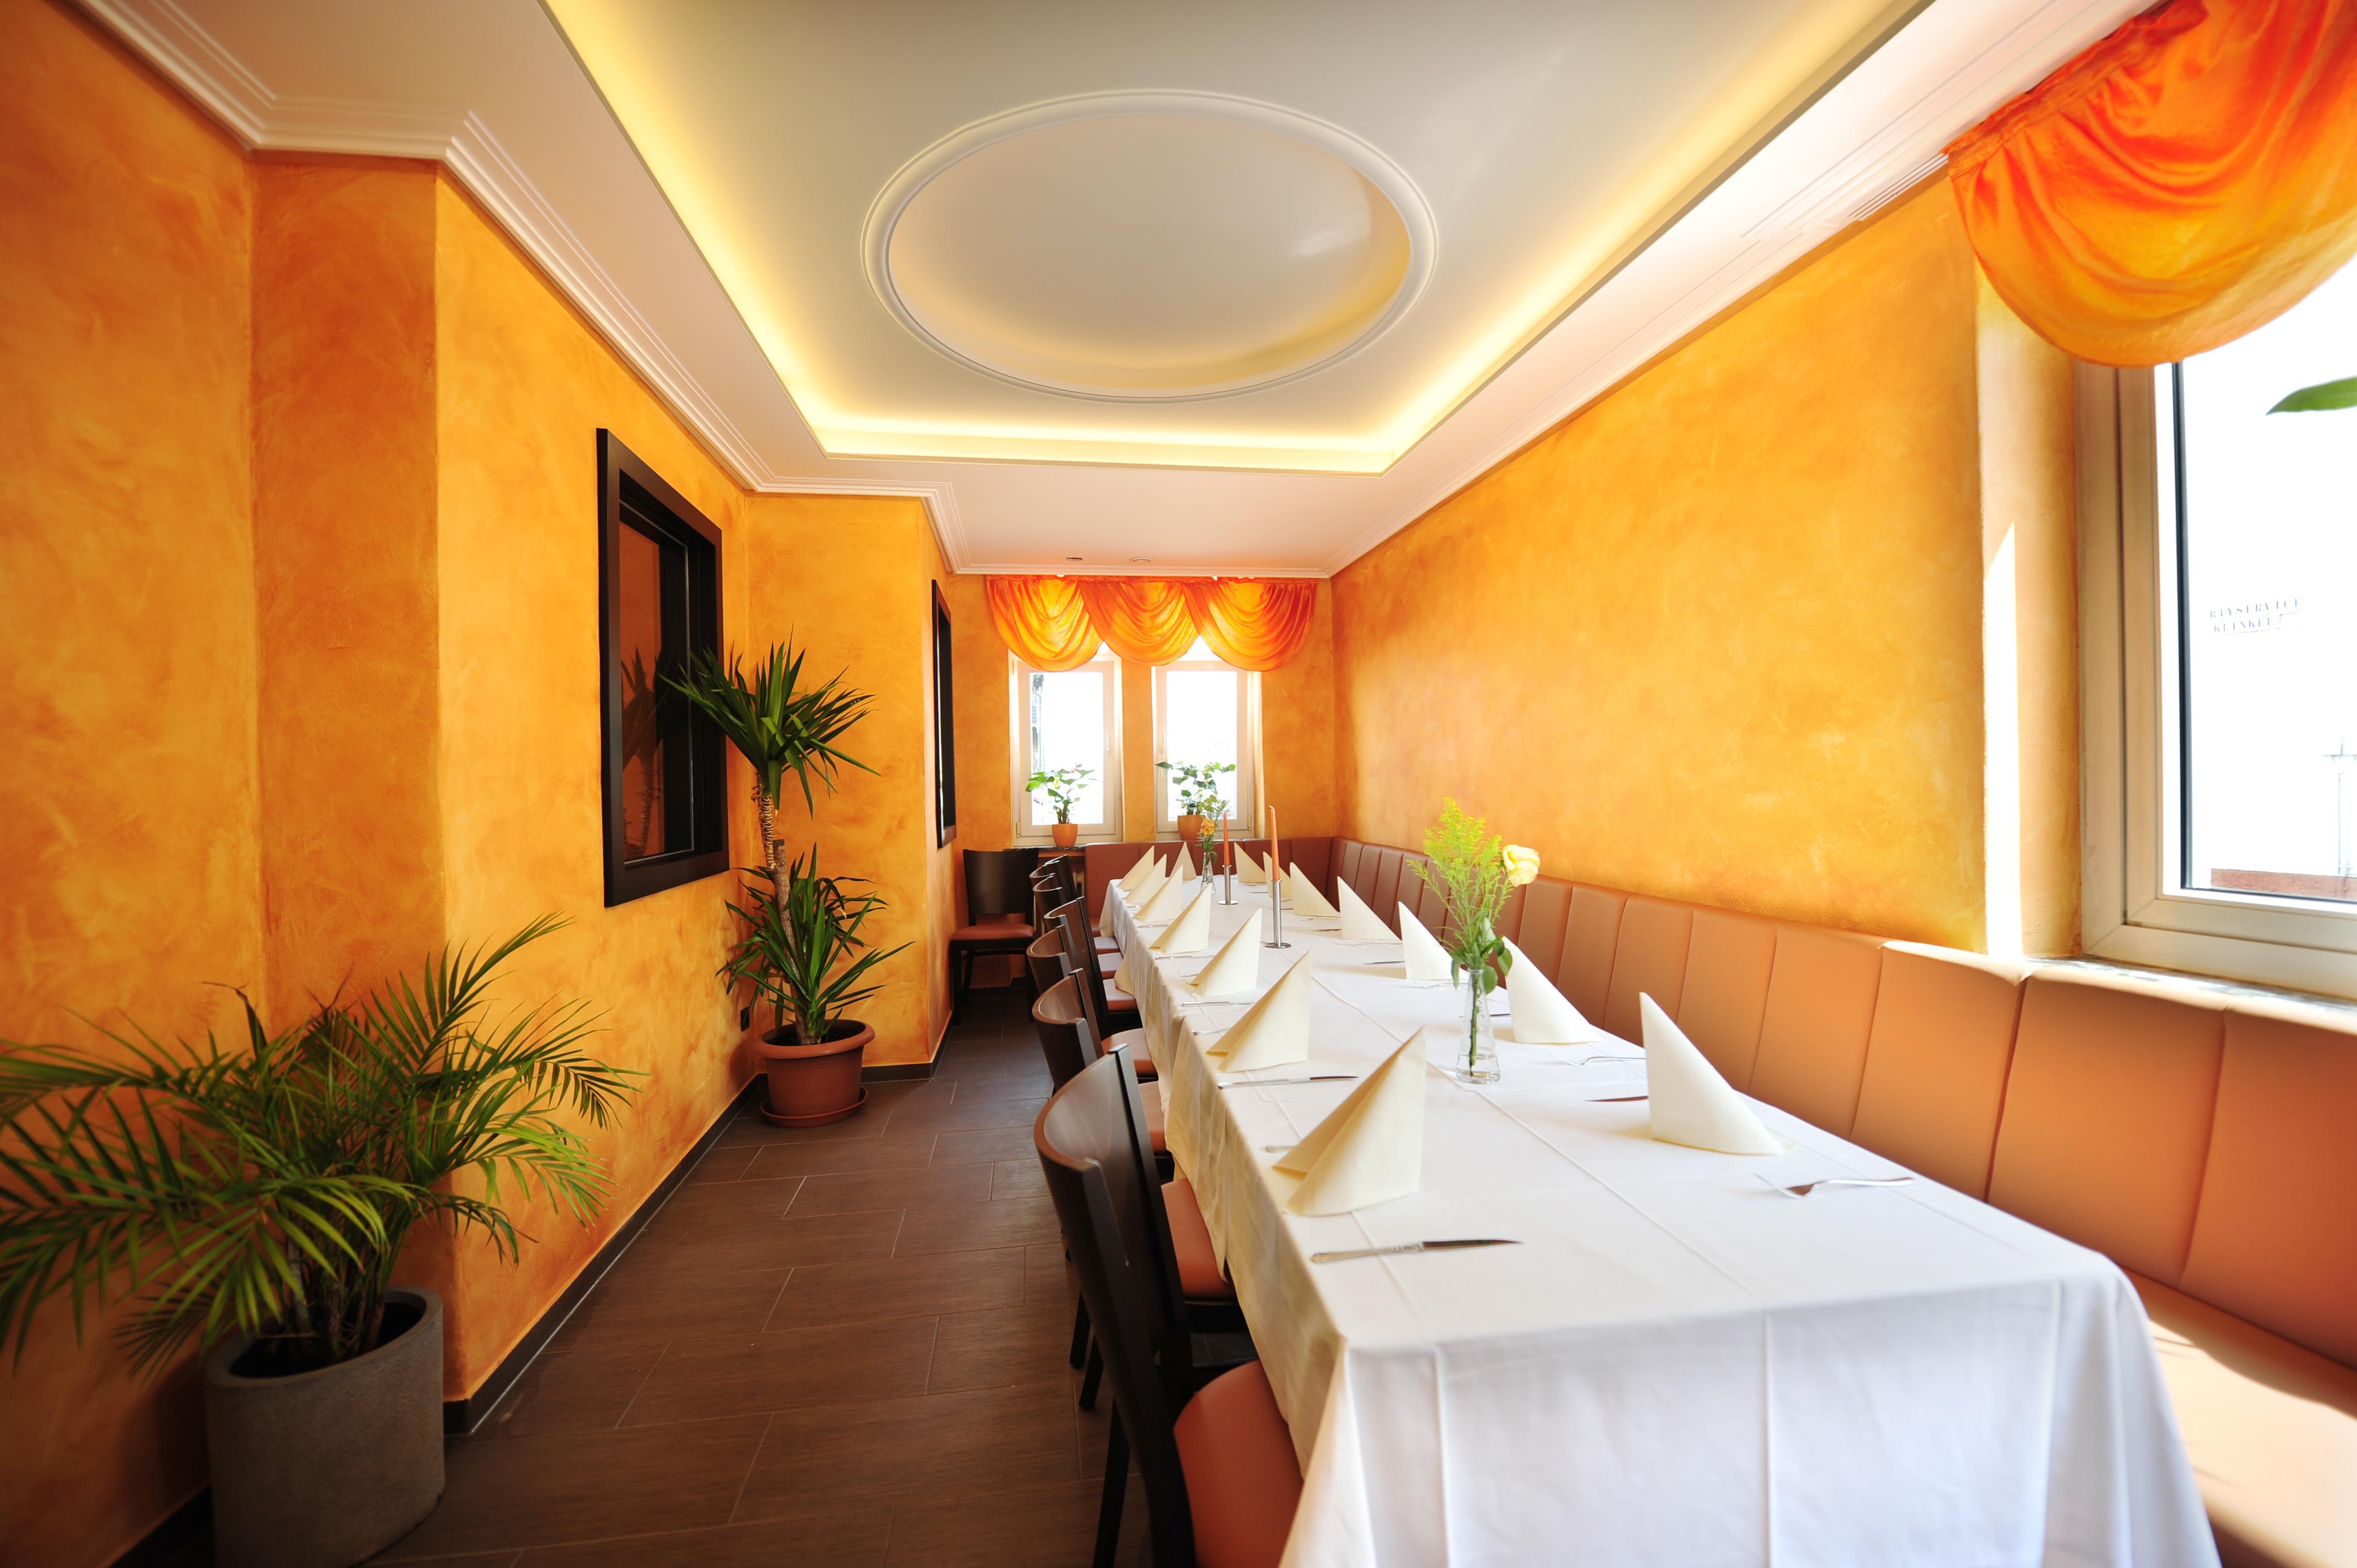 Separee im Restaurant Lava Kroftdorf